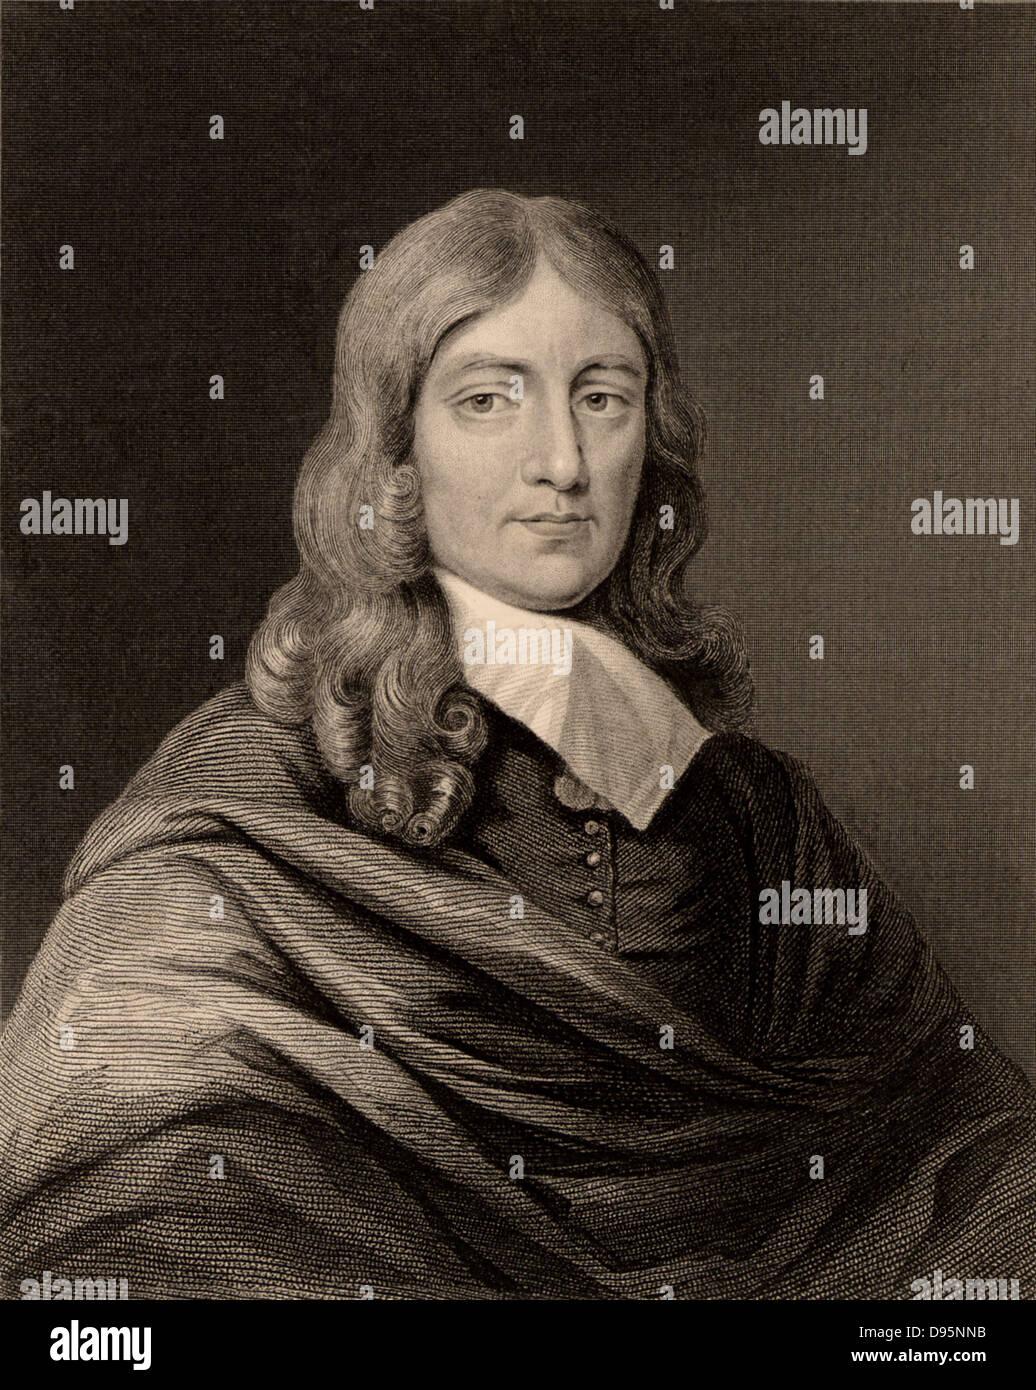 John Milton (1608-1674) English poet, born at Cheapside, London. Engraving.  British Literature - Stock Image